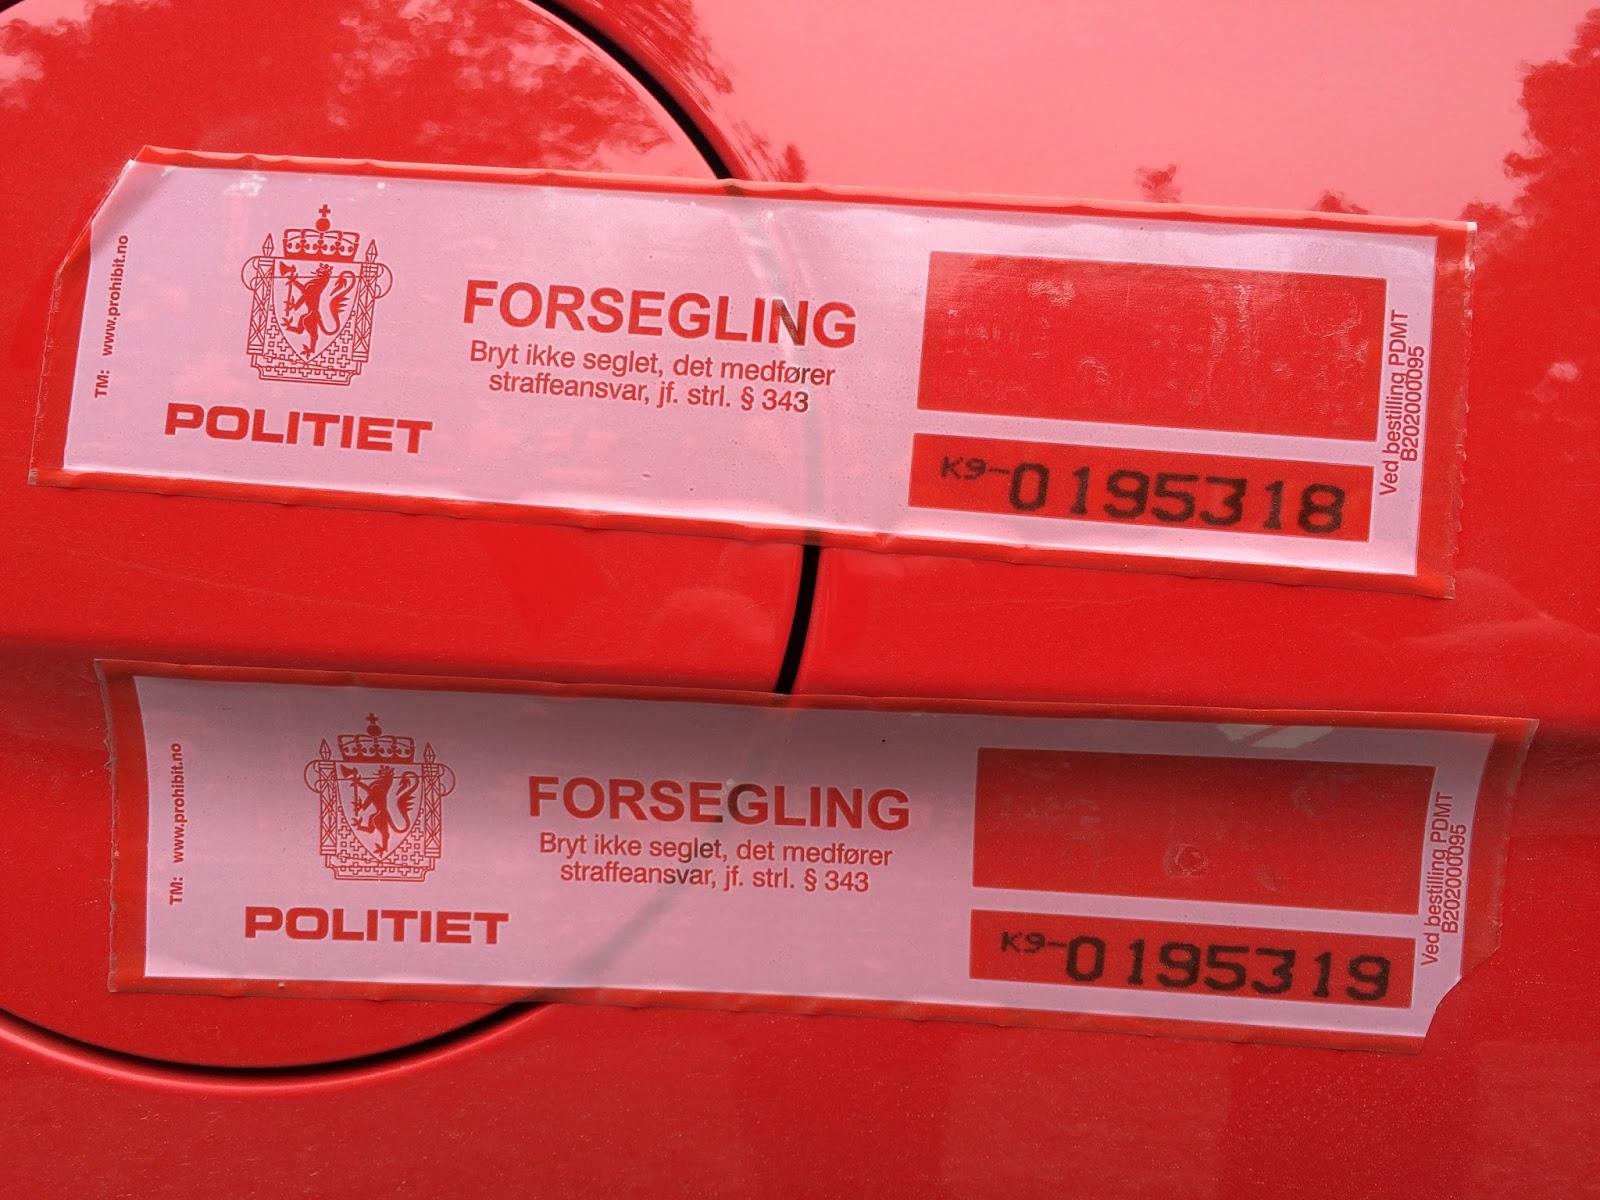 IMG 33862B252822529 Σούπερ εγκρατής οδηγός μιας Mustang, έκανε 1250 χιλιόμετρα με ένα ρεζερβουάρ! Ford, Ford Mustang, Ρεκόρ